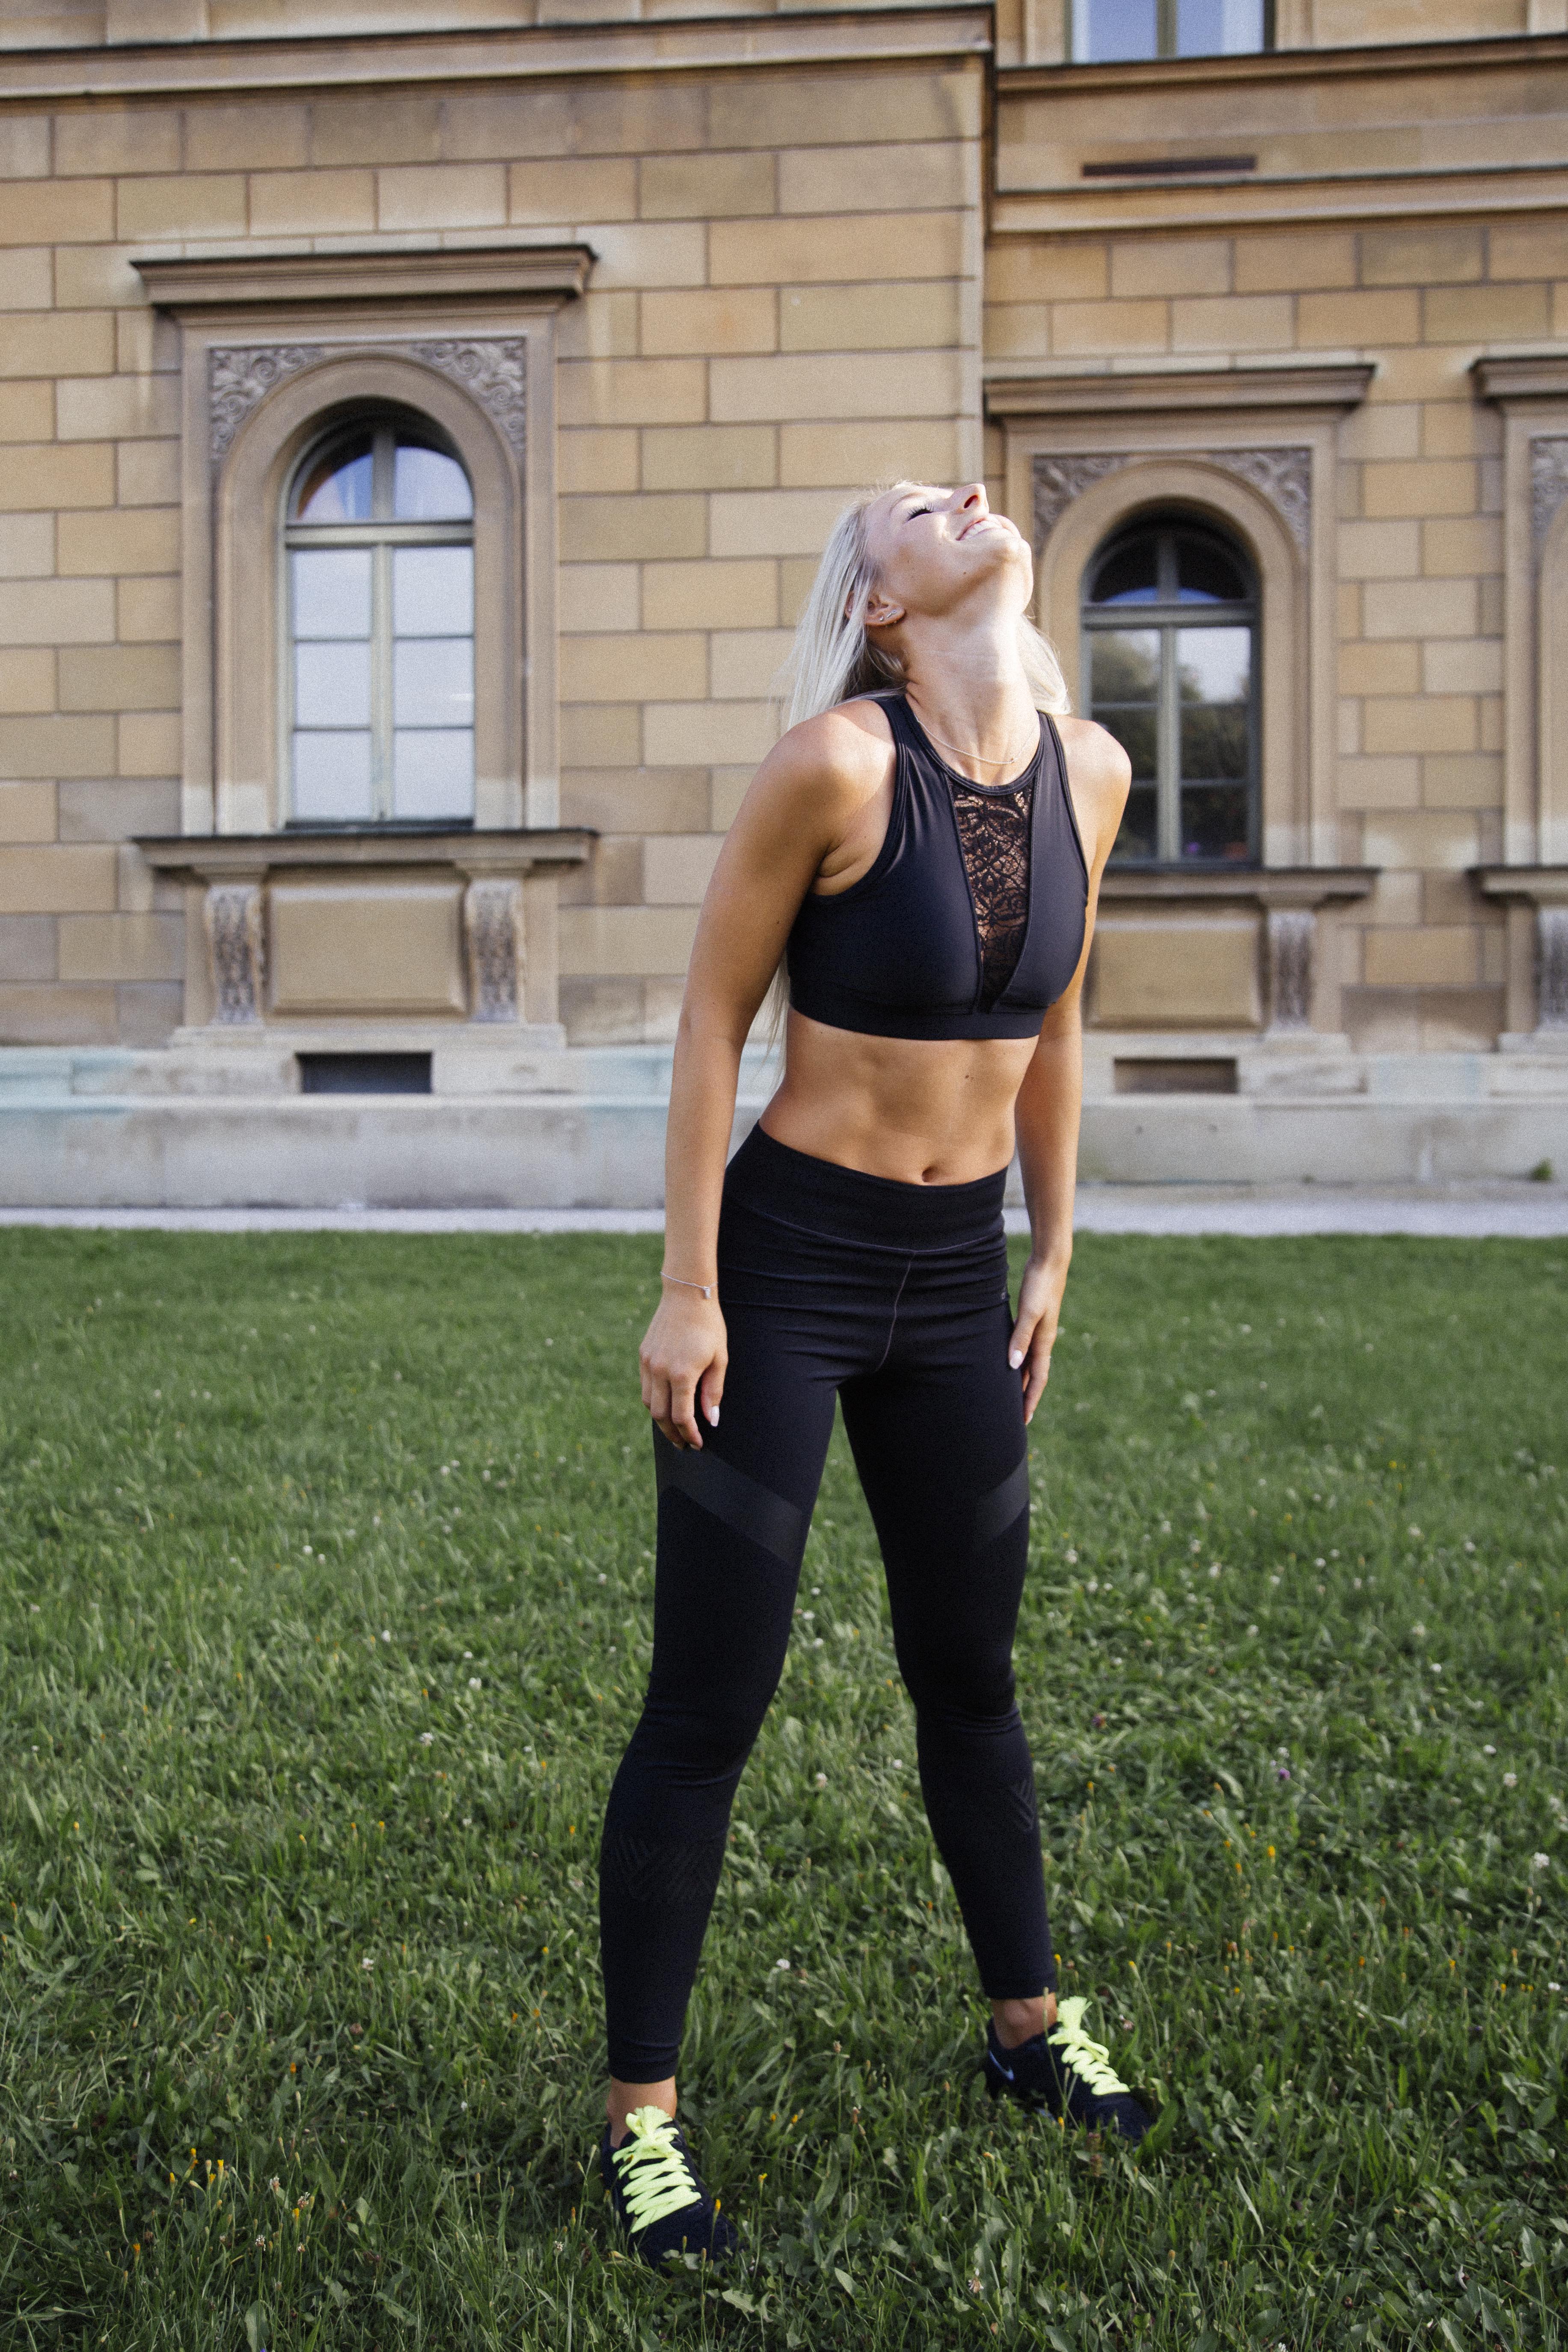 personaltraining_niederbayern_wallersdorf_zumba_fitnessbox_45SECONDS_Detox